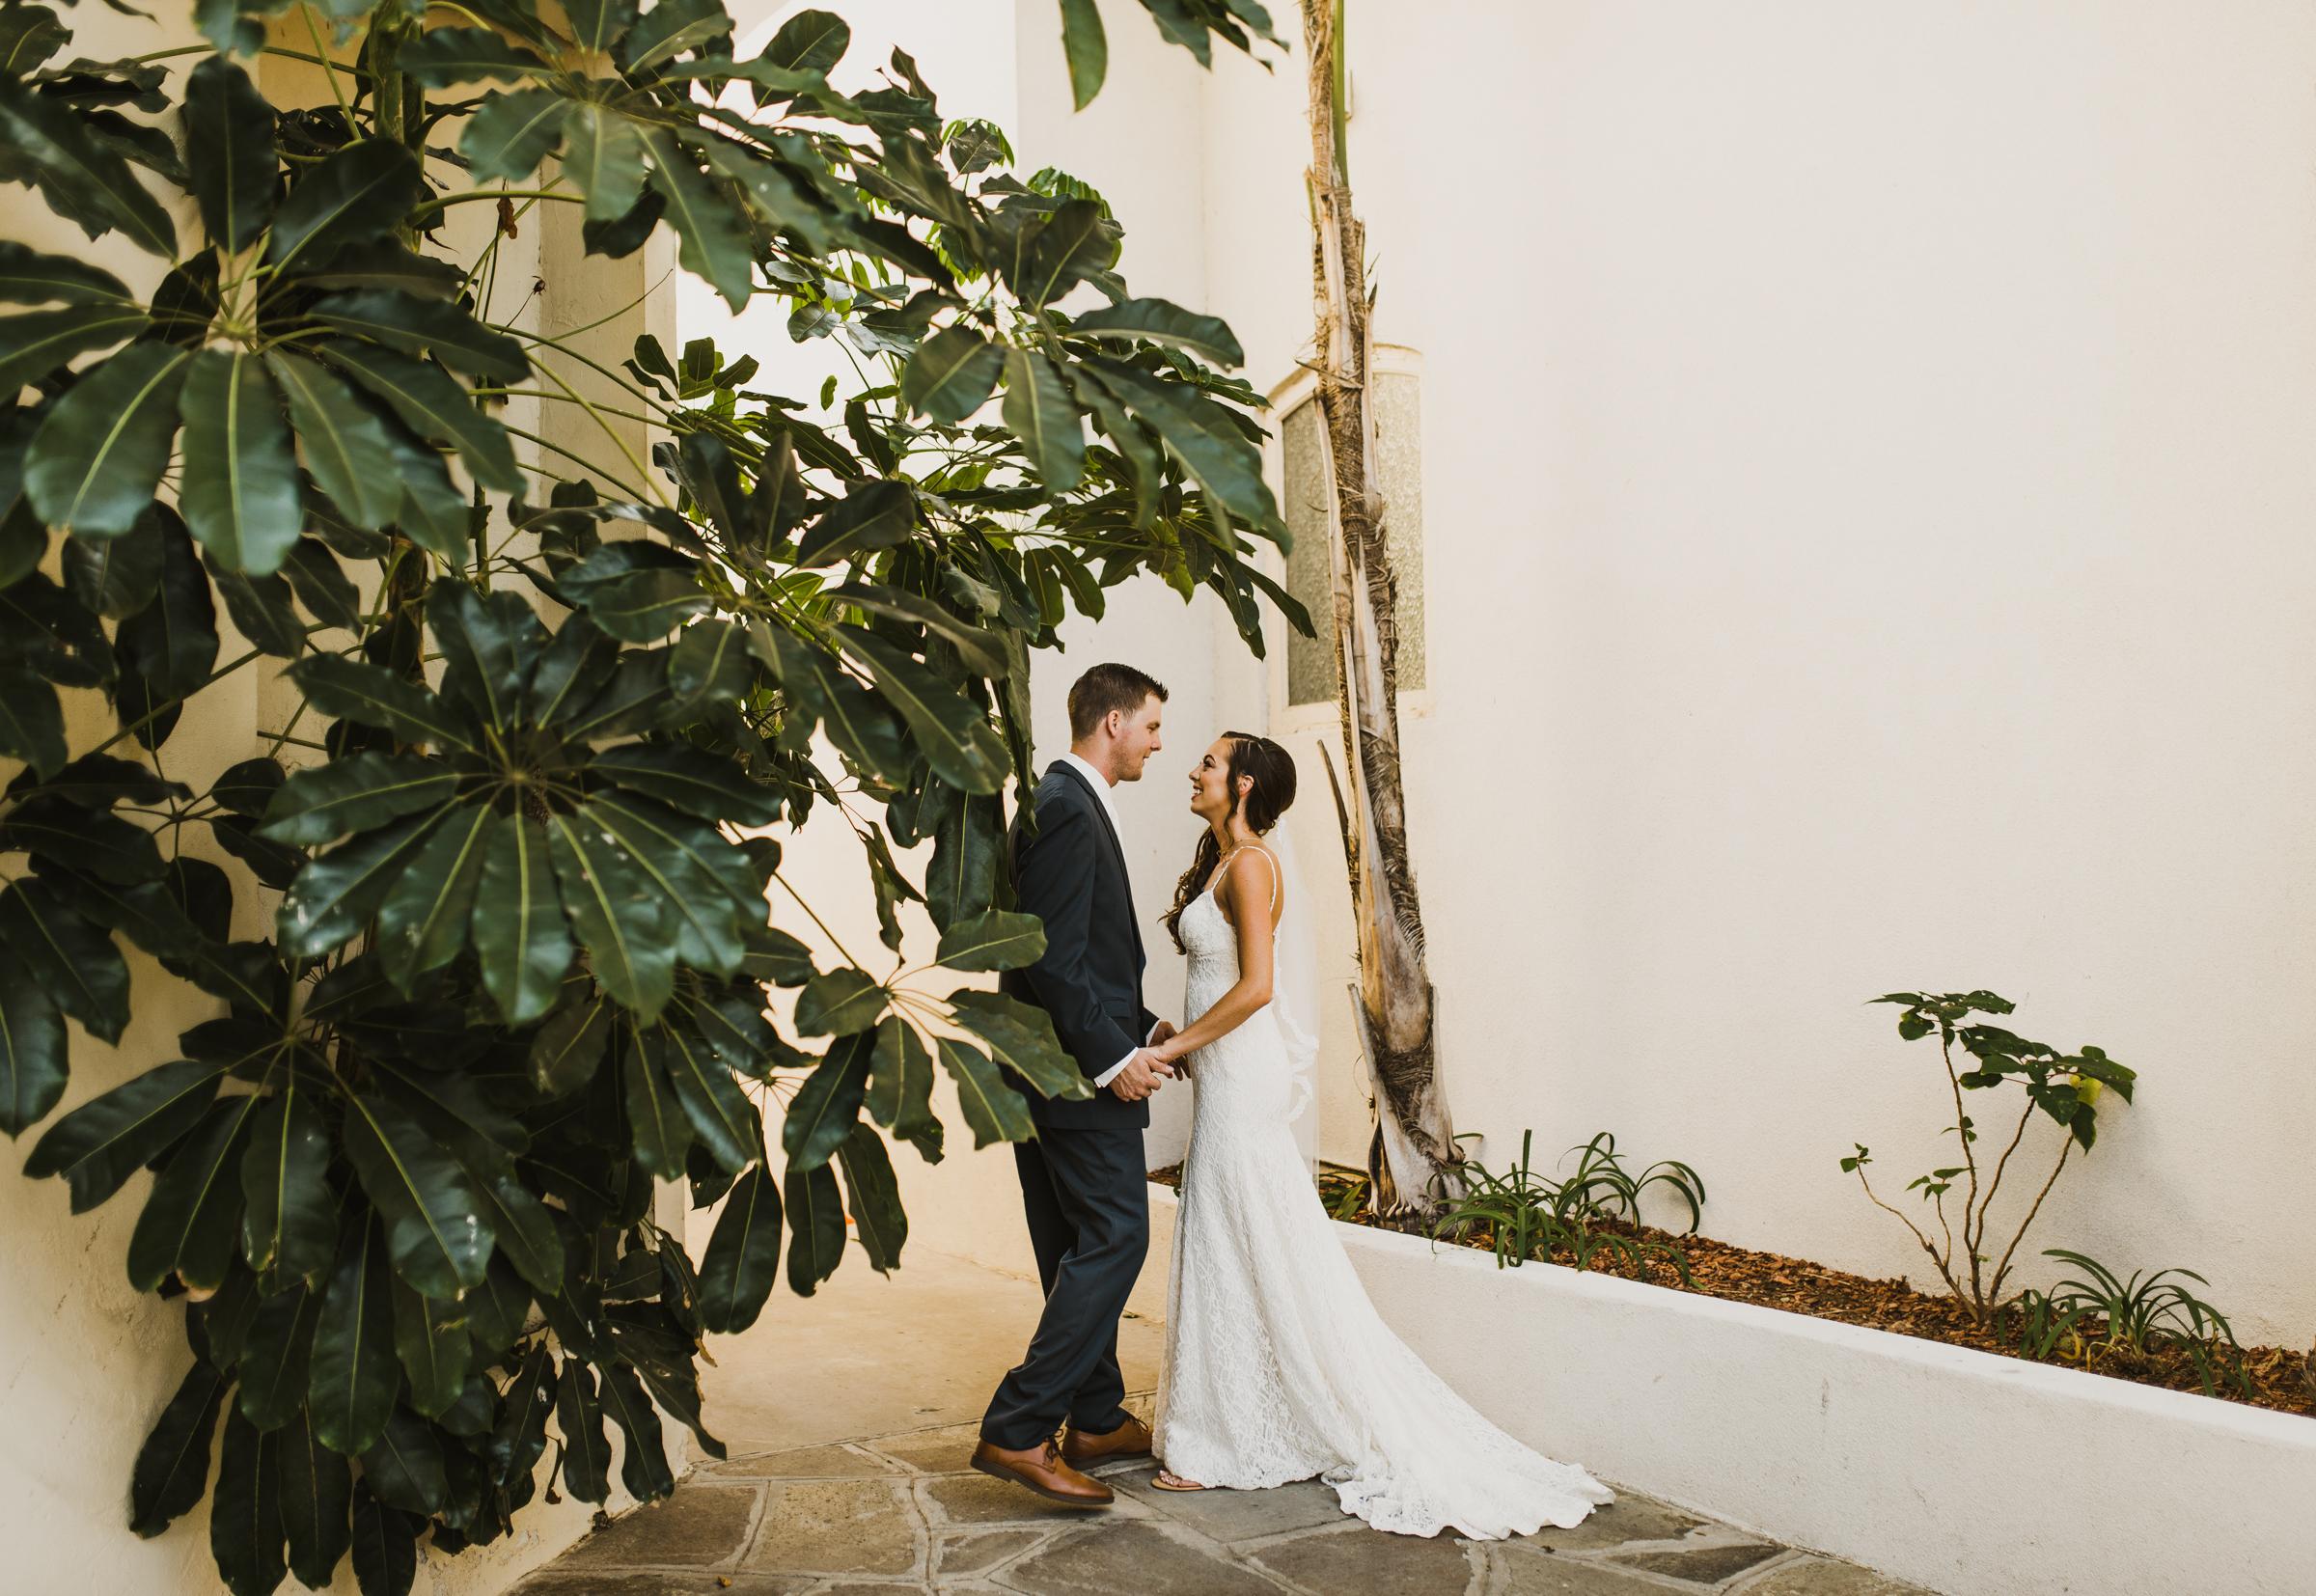 ©Isaiah + Taylor Photography - Rosarito Beach Destination Wedding, Mexico-0046.jpg